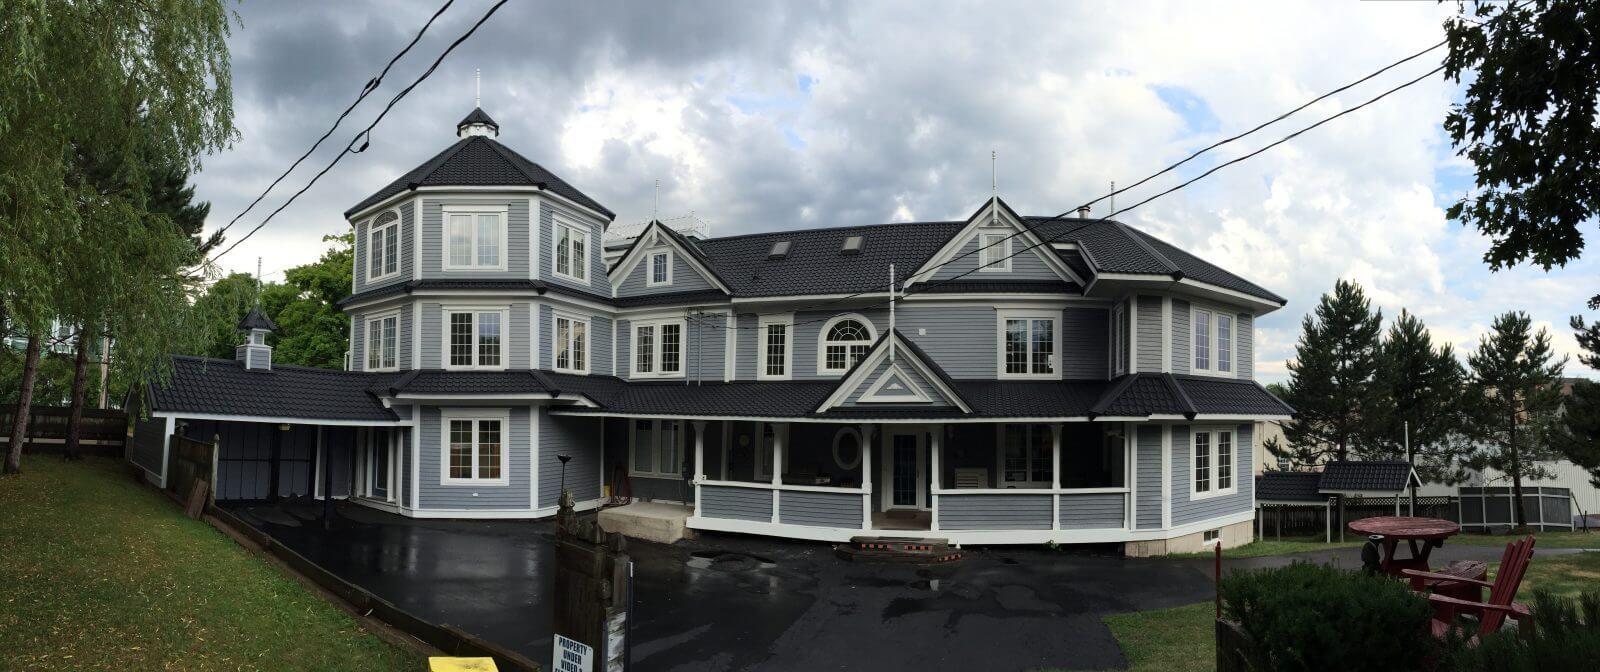 Black Roofs 11